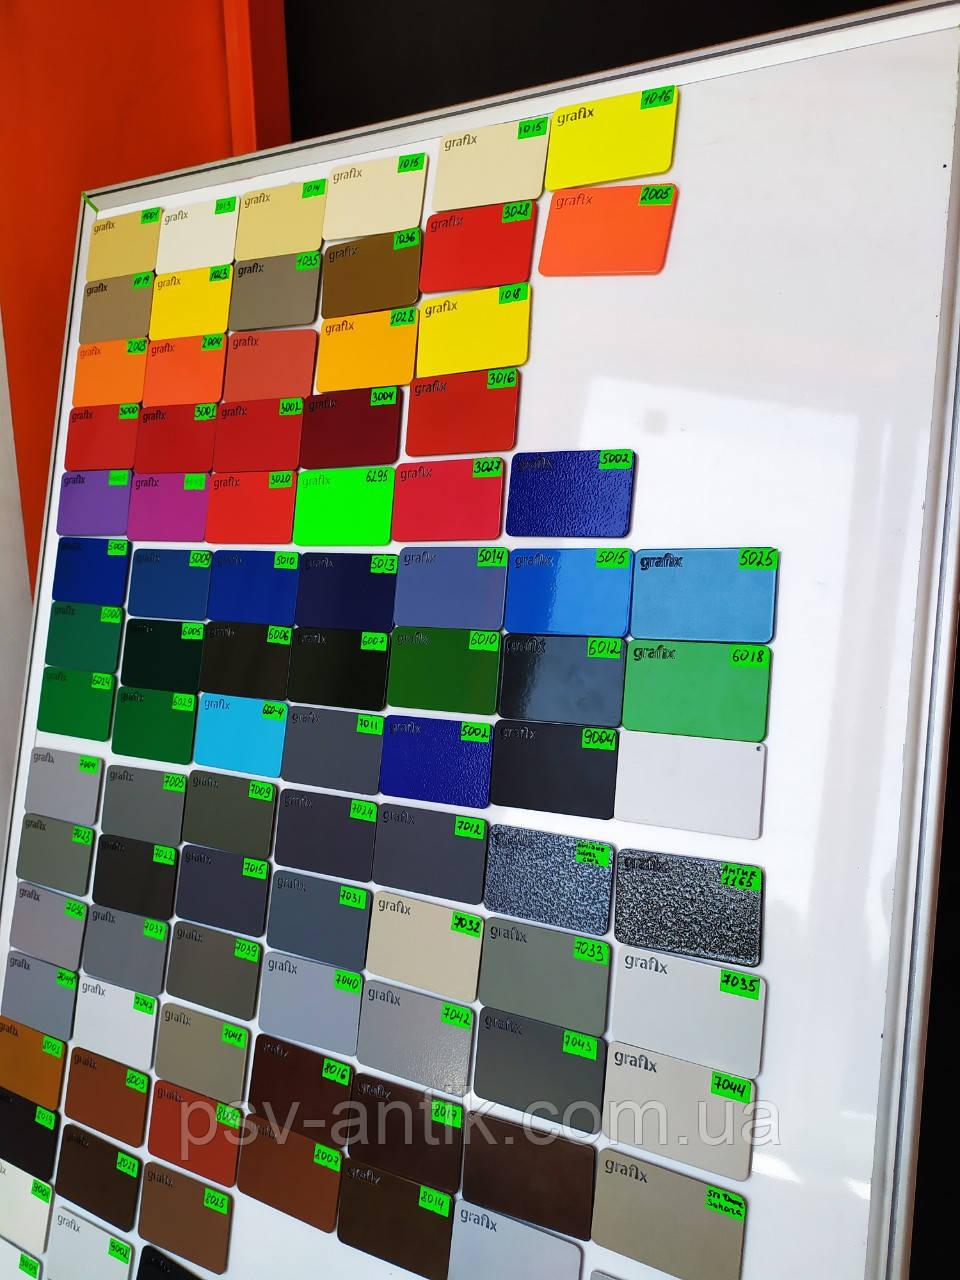 Порошковая краска глянцевая, полиэфирная, архитектурная, 3032